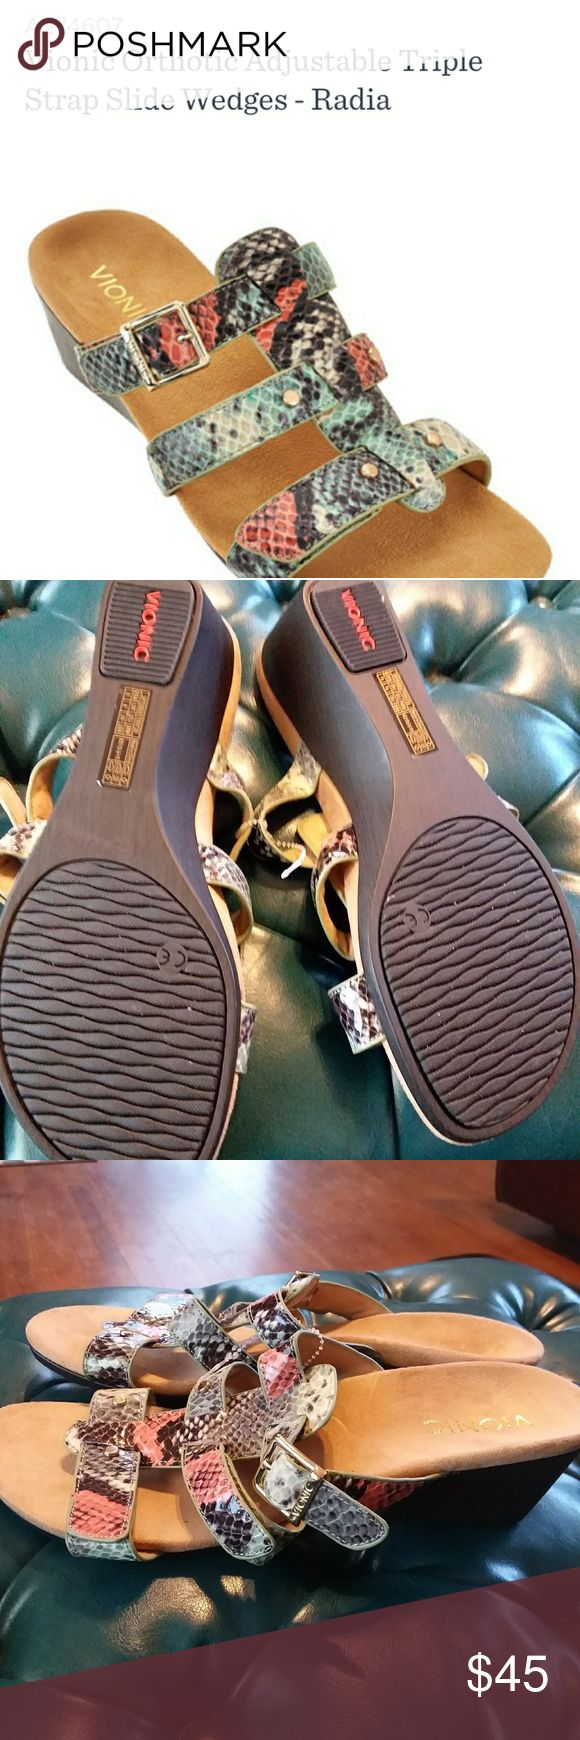 Vionic. sz 8 Radia Triple Strap sandal QVC item return. Very nice preowned condition. Smoke free. Sz 8. Has QVC item number written on bottom of soles.  Very nice. Vionic Shoes Sandals